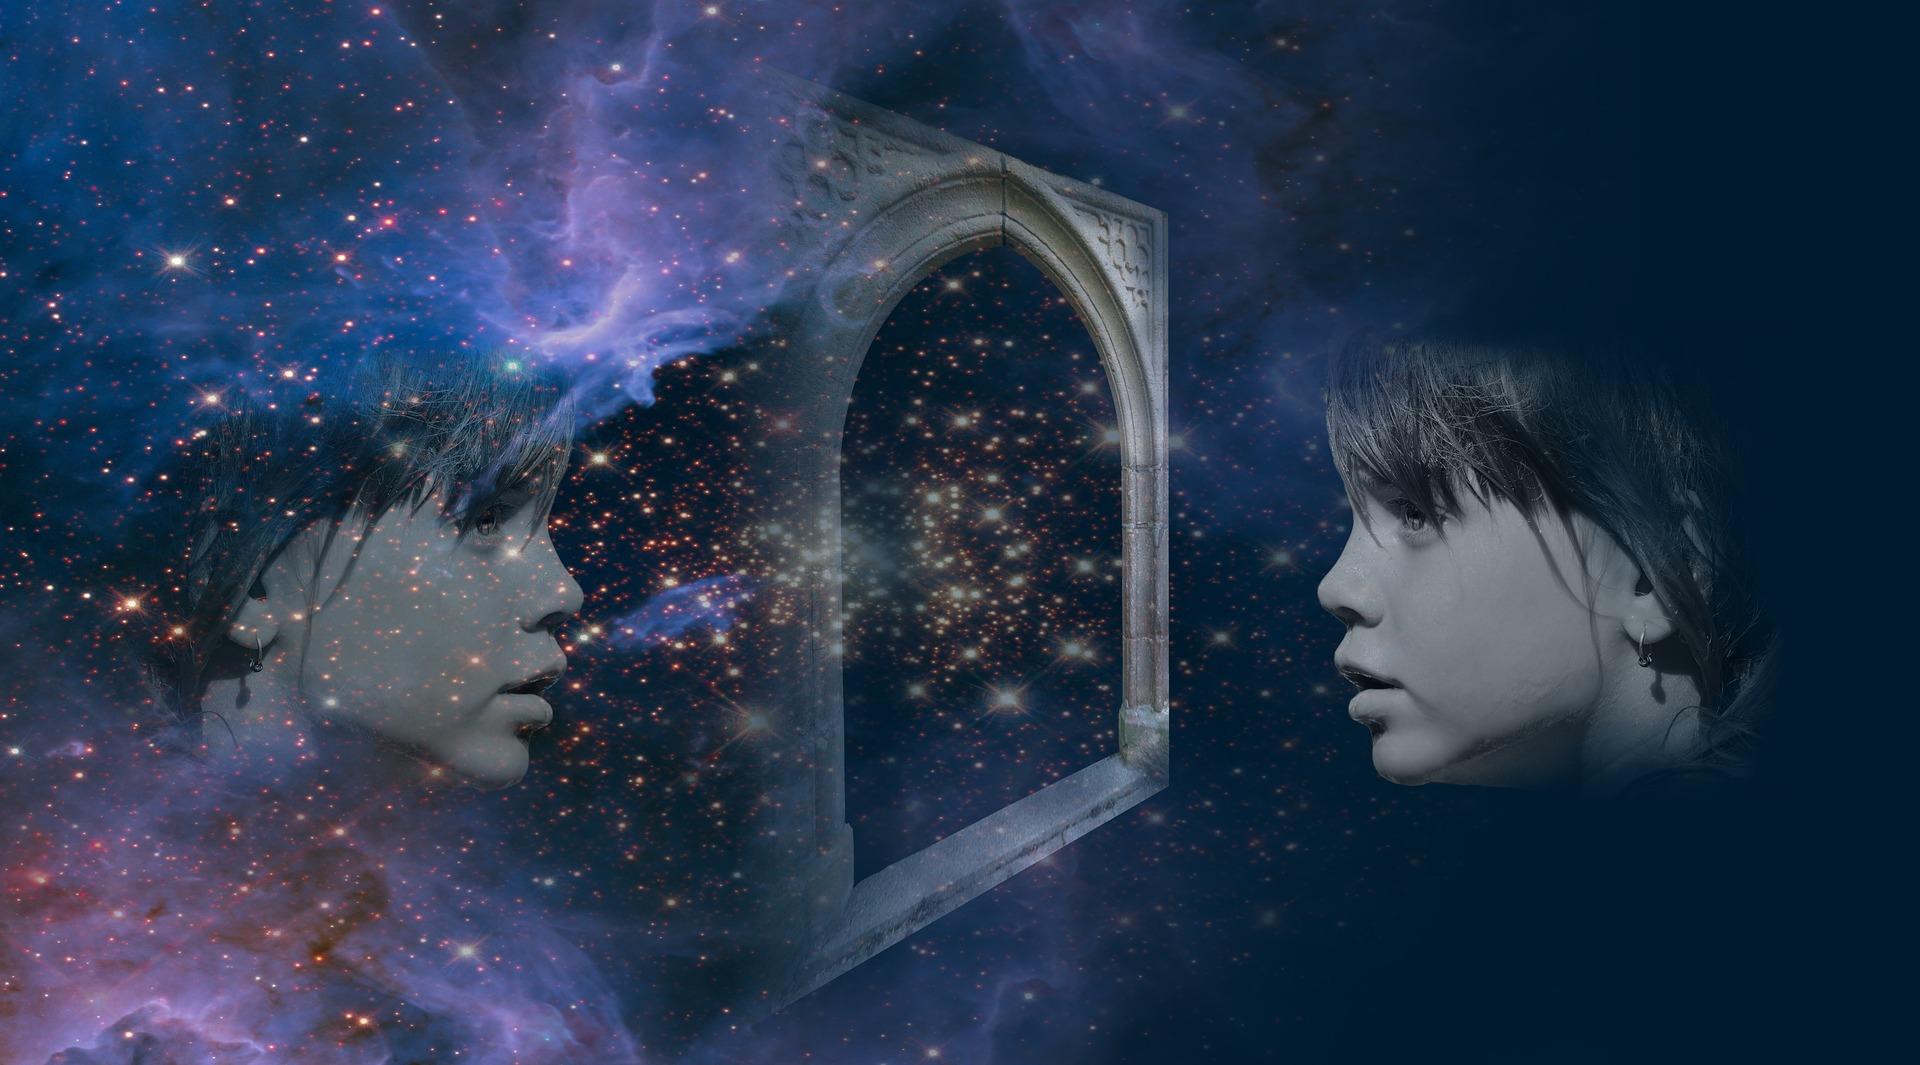 Metafysisk terapi - tidigare liv